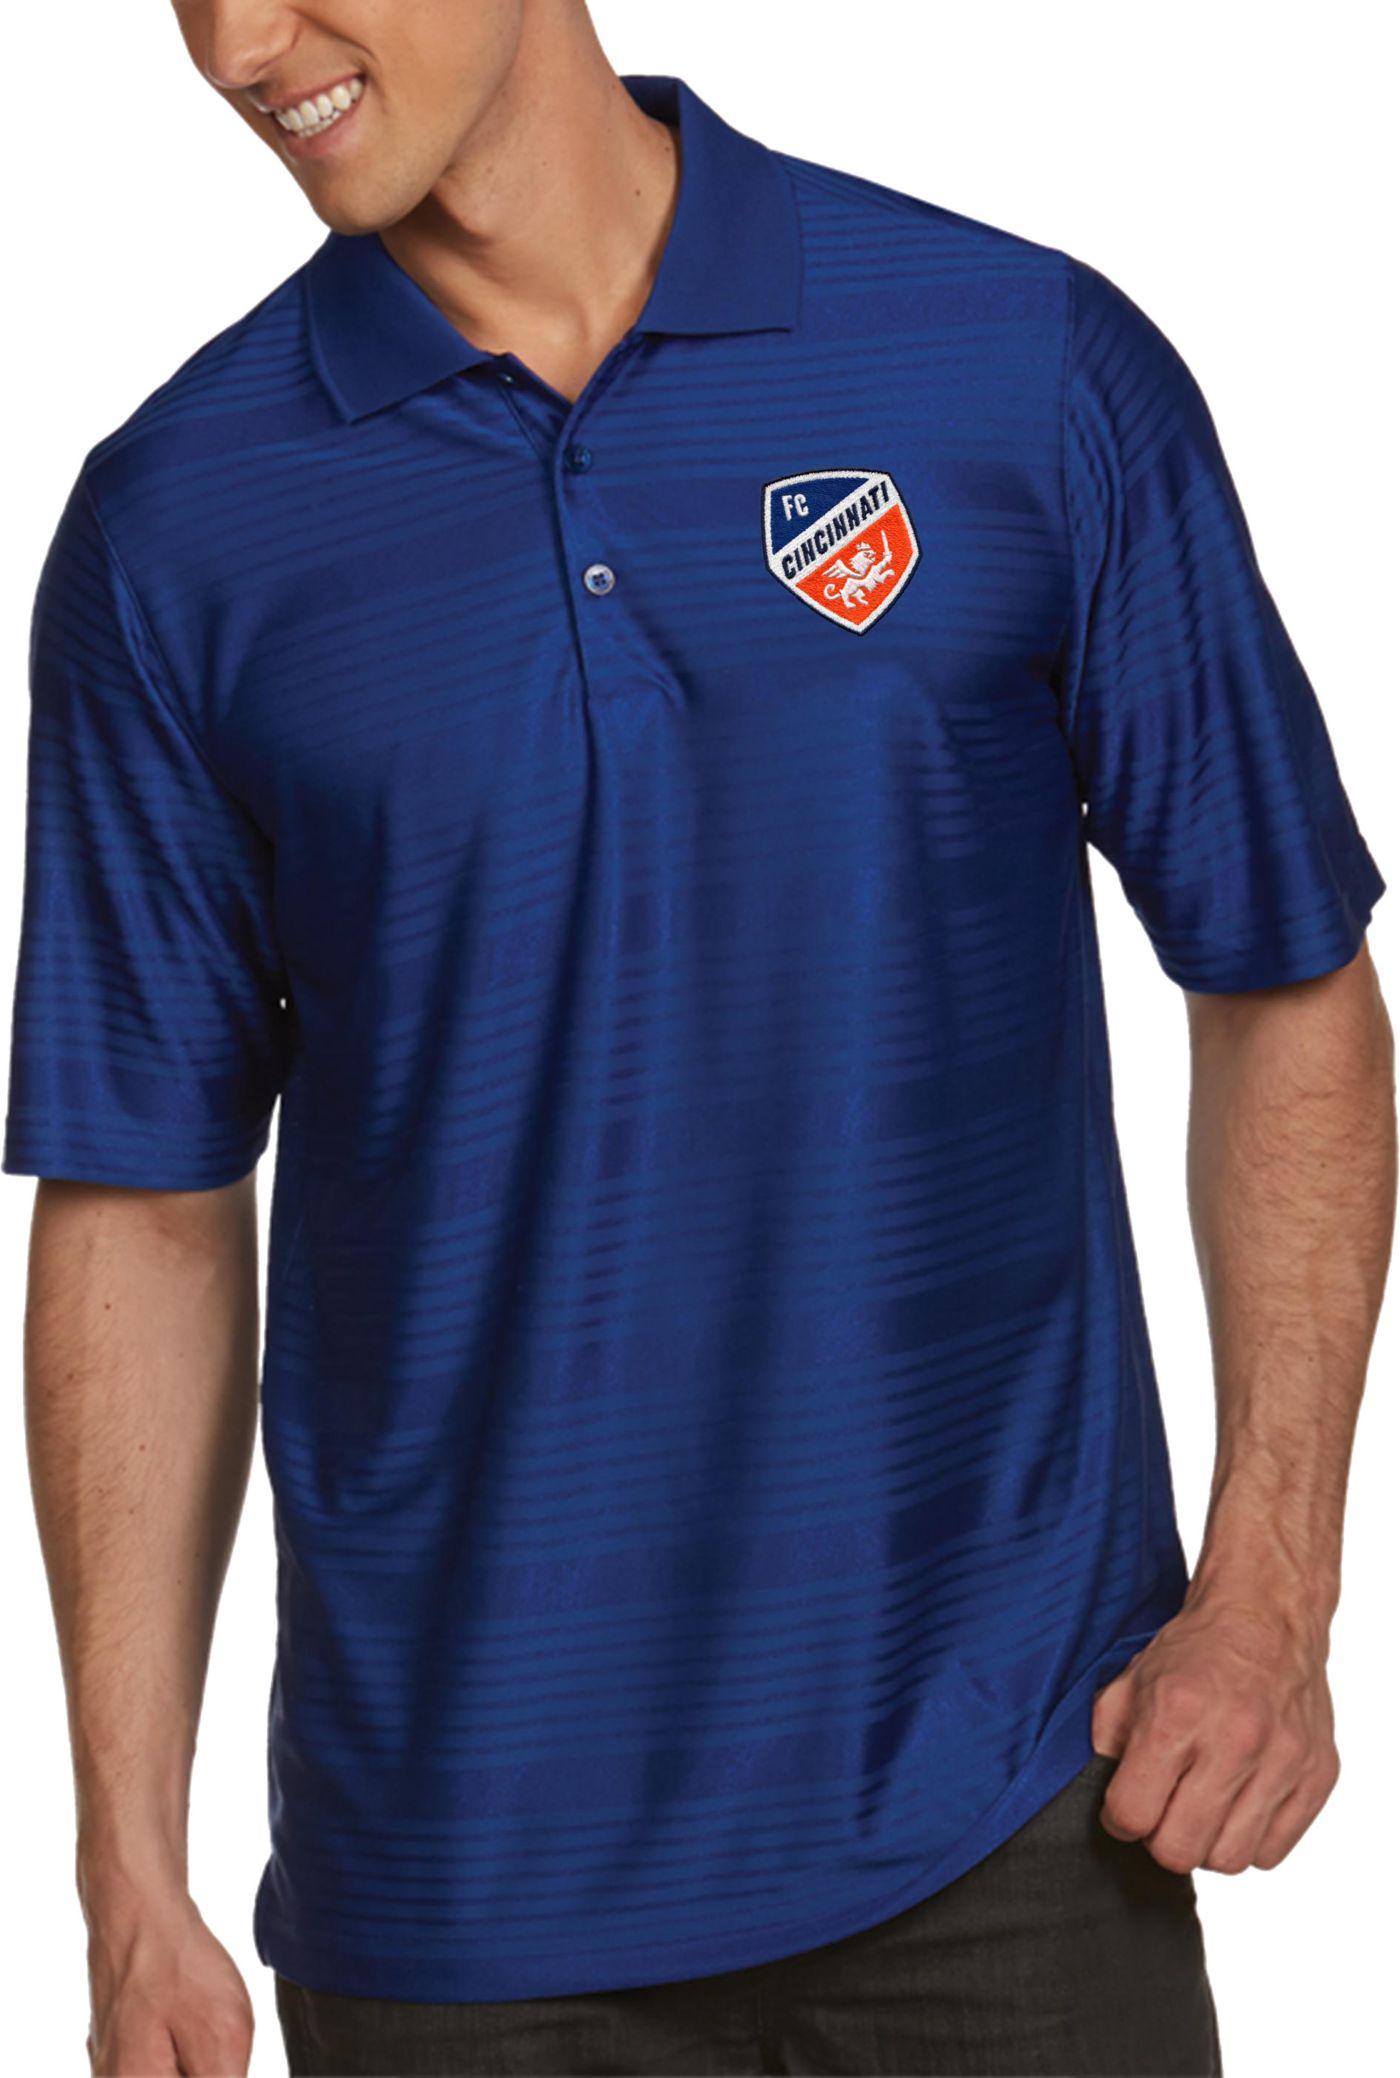 Antigua Men's FC Cincinnati Illusion Royal Pullover